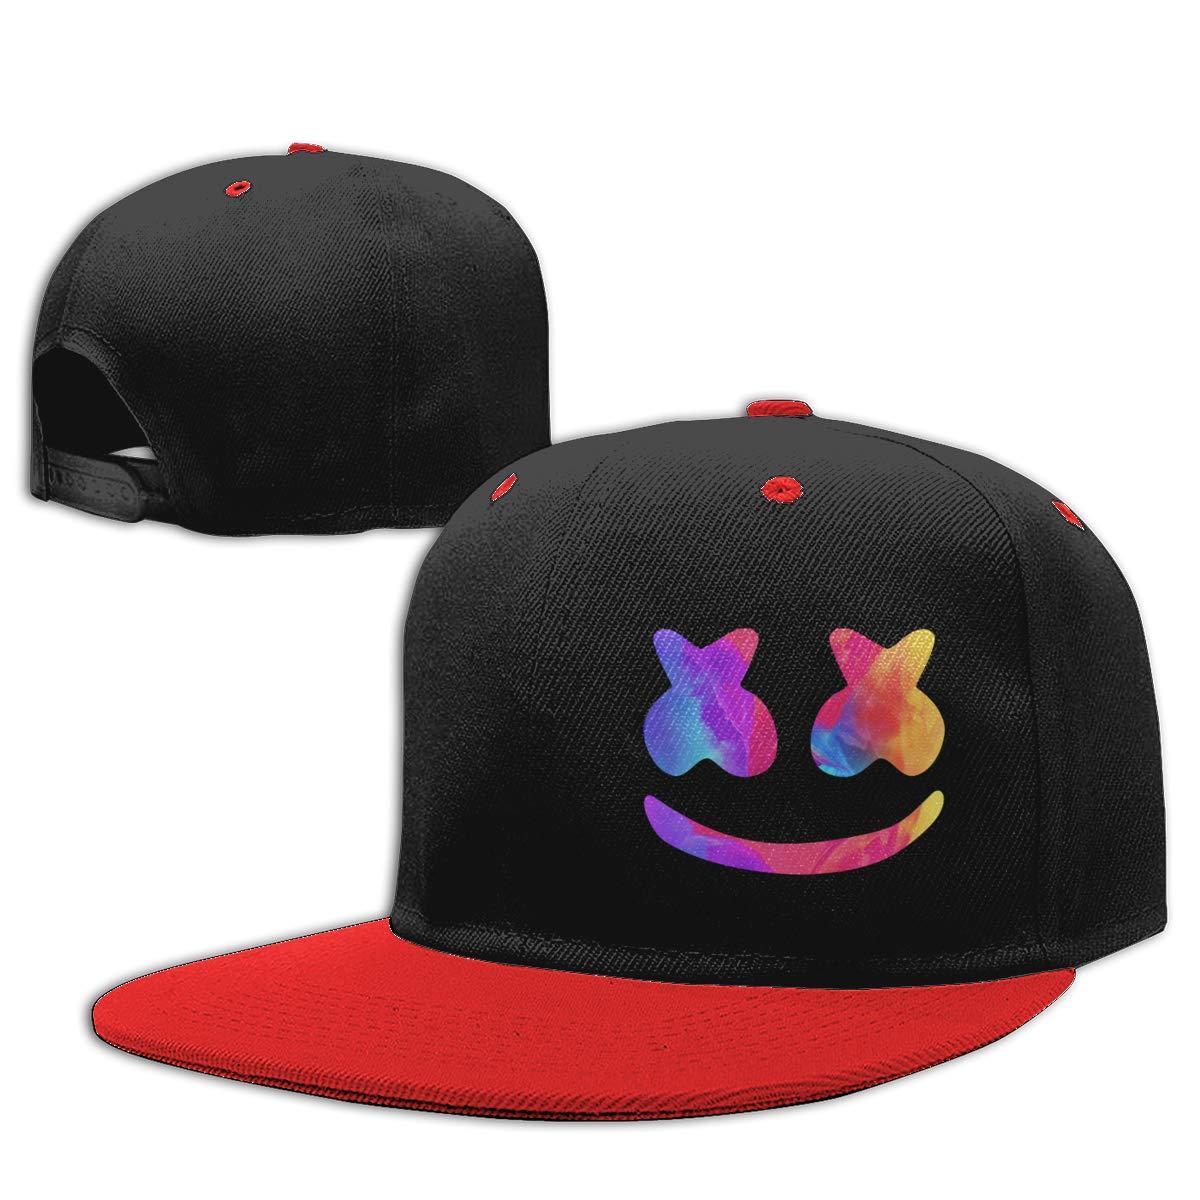 Amazon.com  Fzjy Wnx Marshmello Helmet Hip Hop Baseball Caps Kids Snapback  Hat Girls Boys  Red  Clothing f2989d2bc19